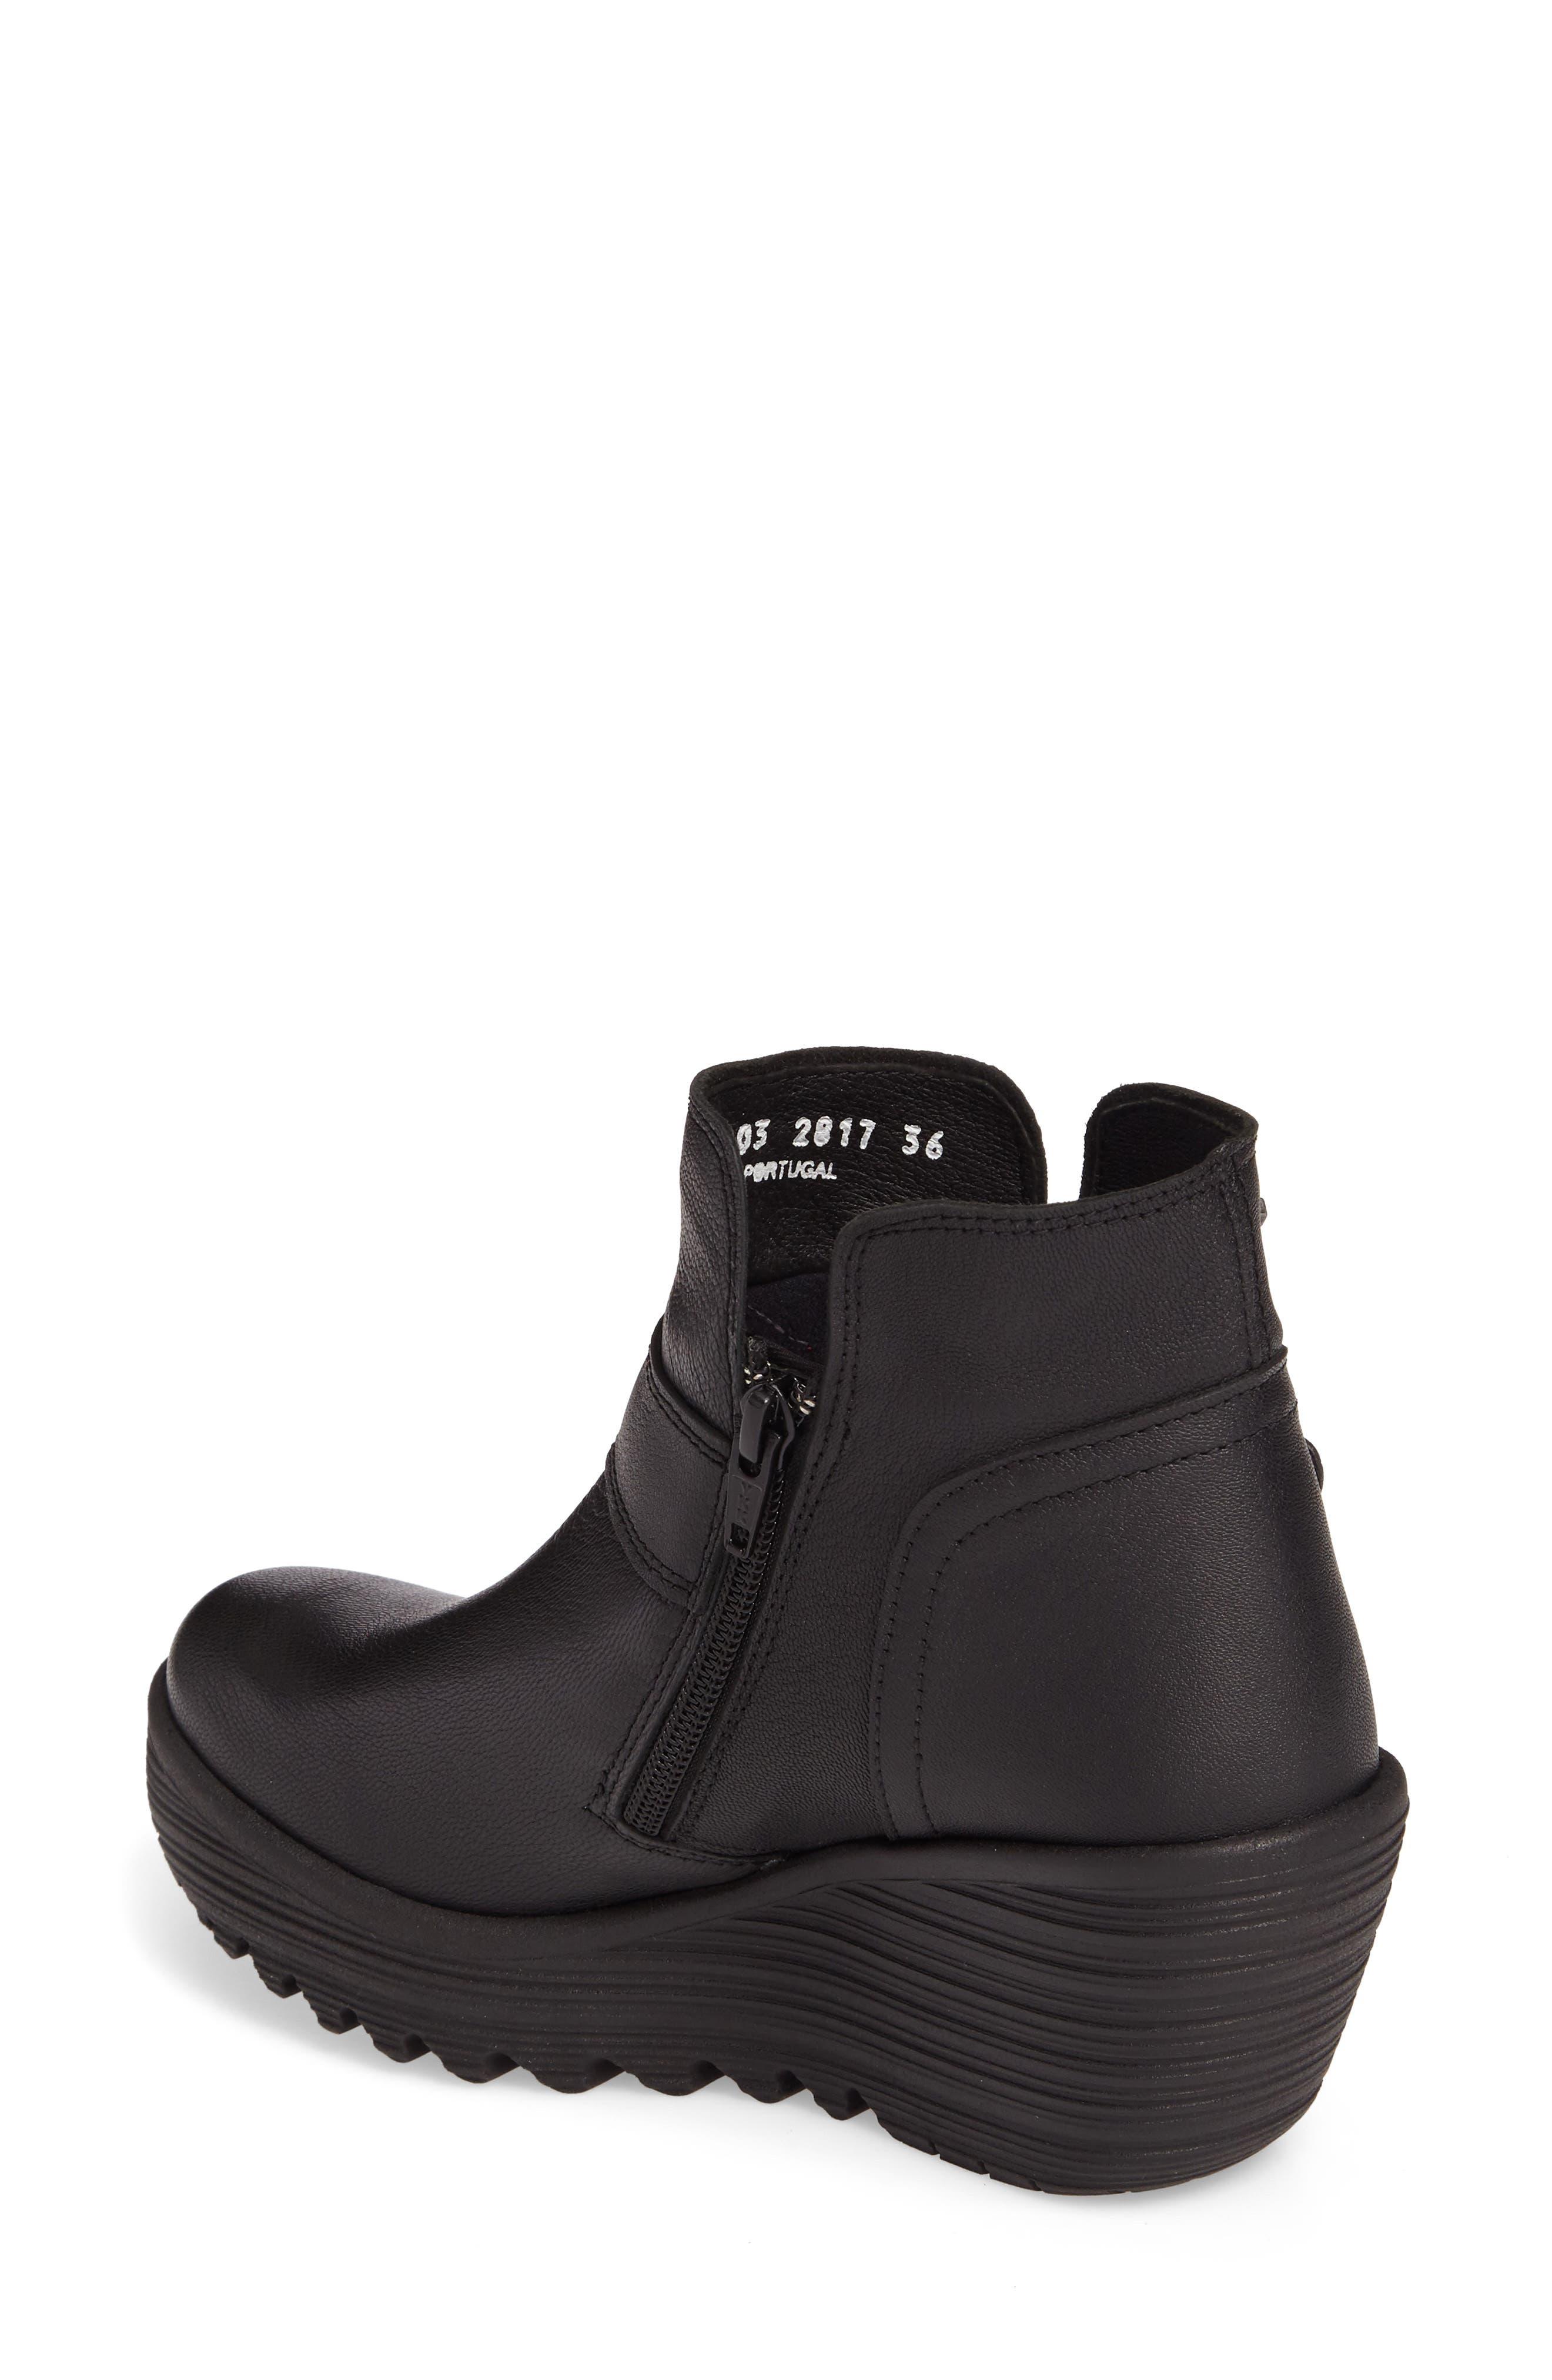 Yock Waterproof Gore-Tex<sup>®</sup> Wedge Boot,                             Alternate thumbnail 2, color,                             001